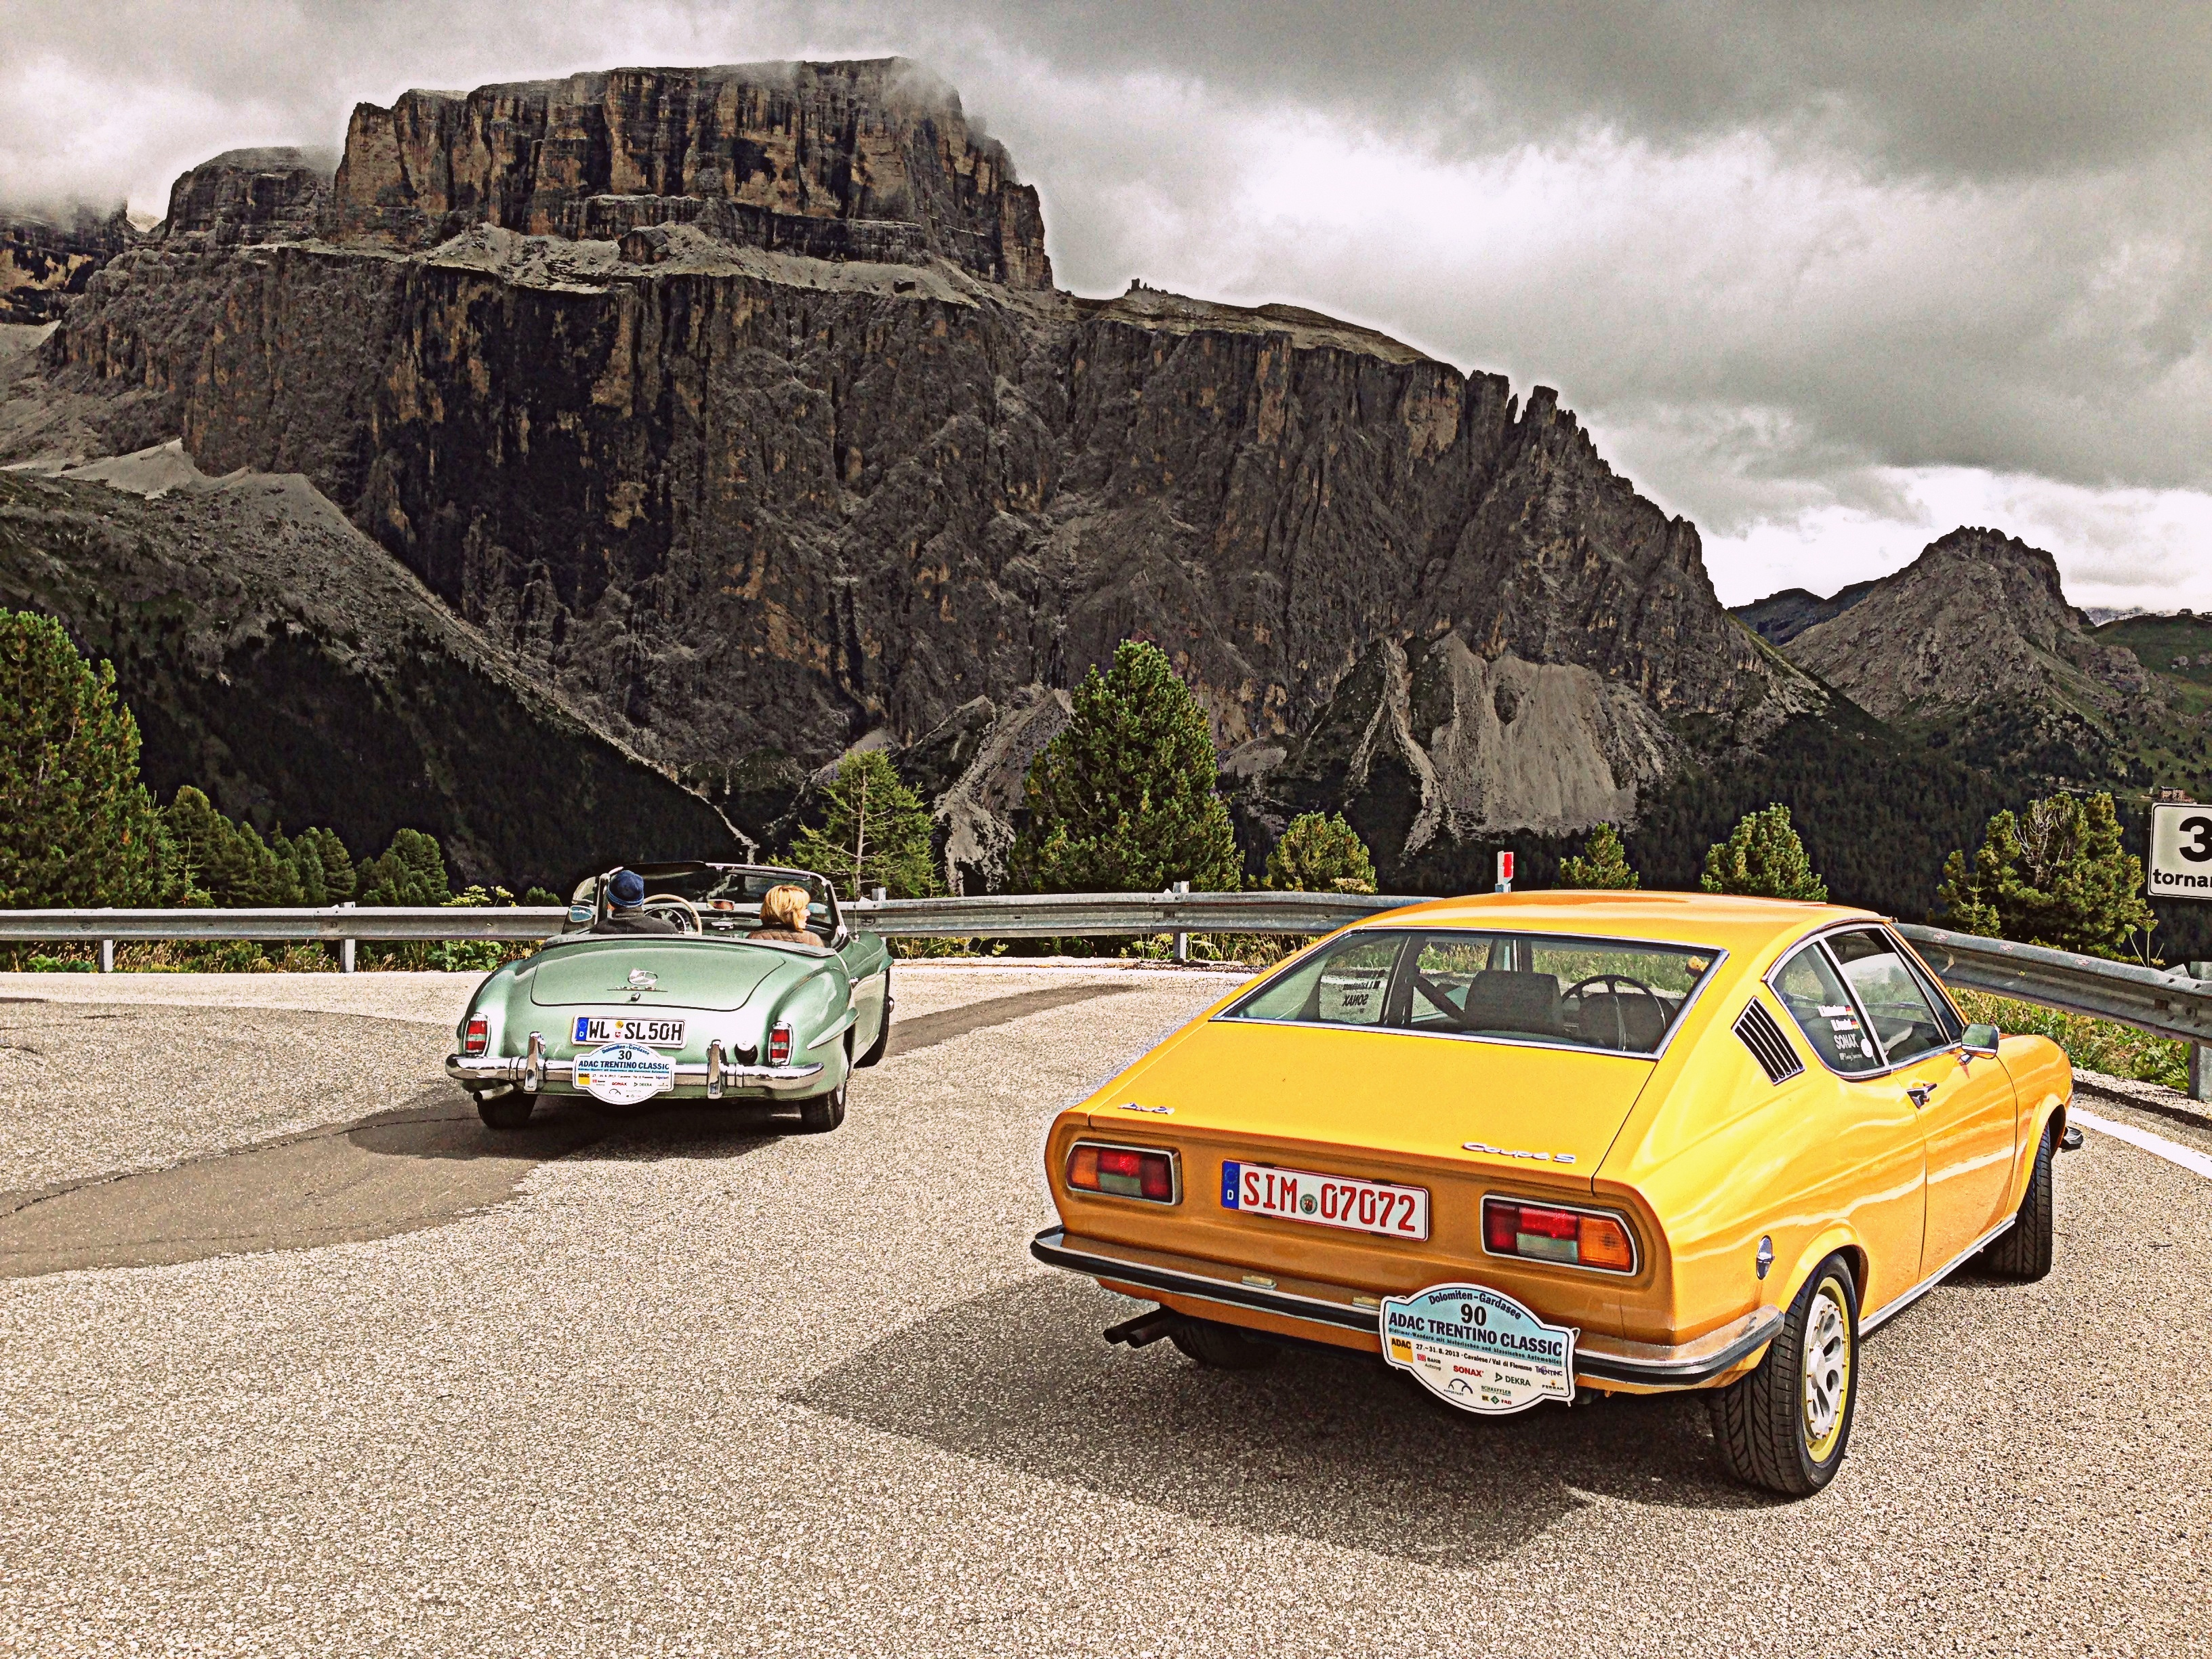 ADAC Trentino Classic 2013 Video